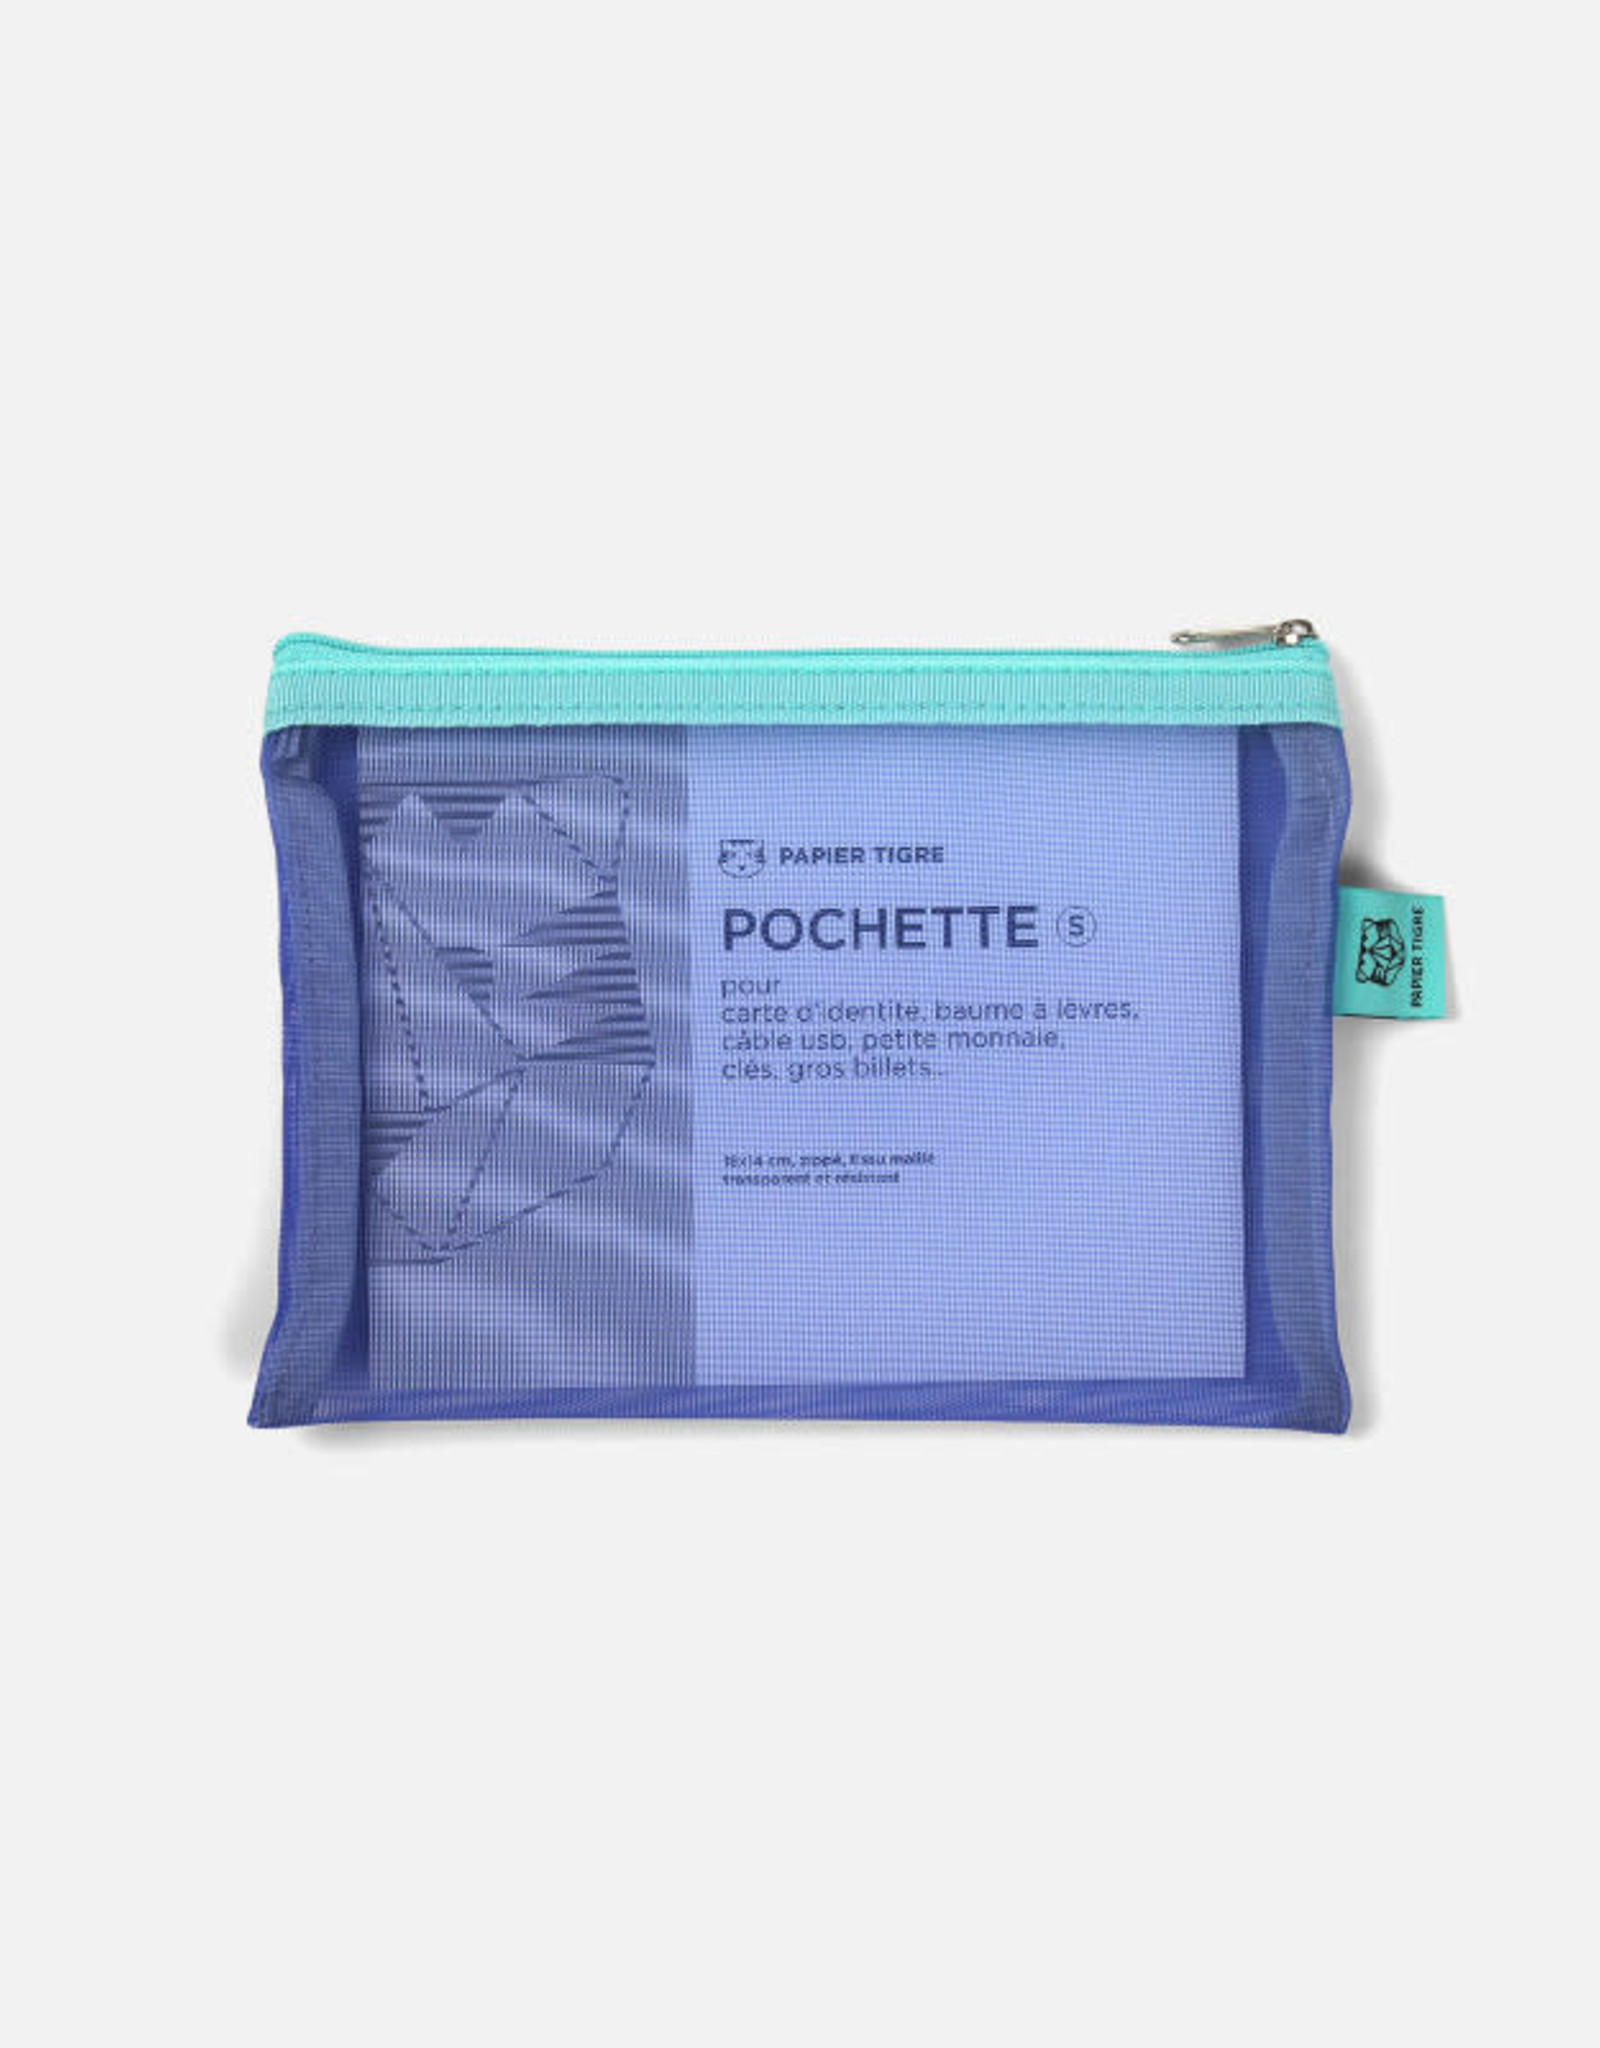 Papier Tigre Papier Tigre Mini Mesh Pocket (A6)